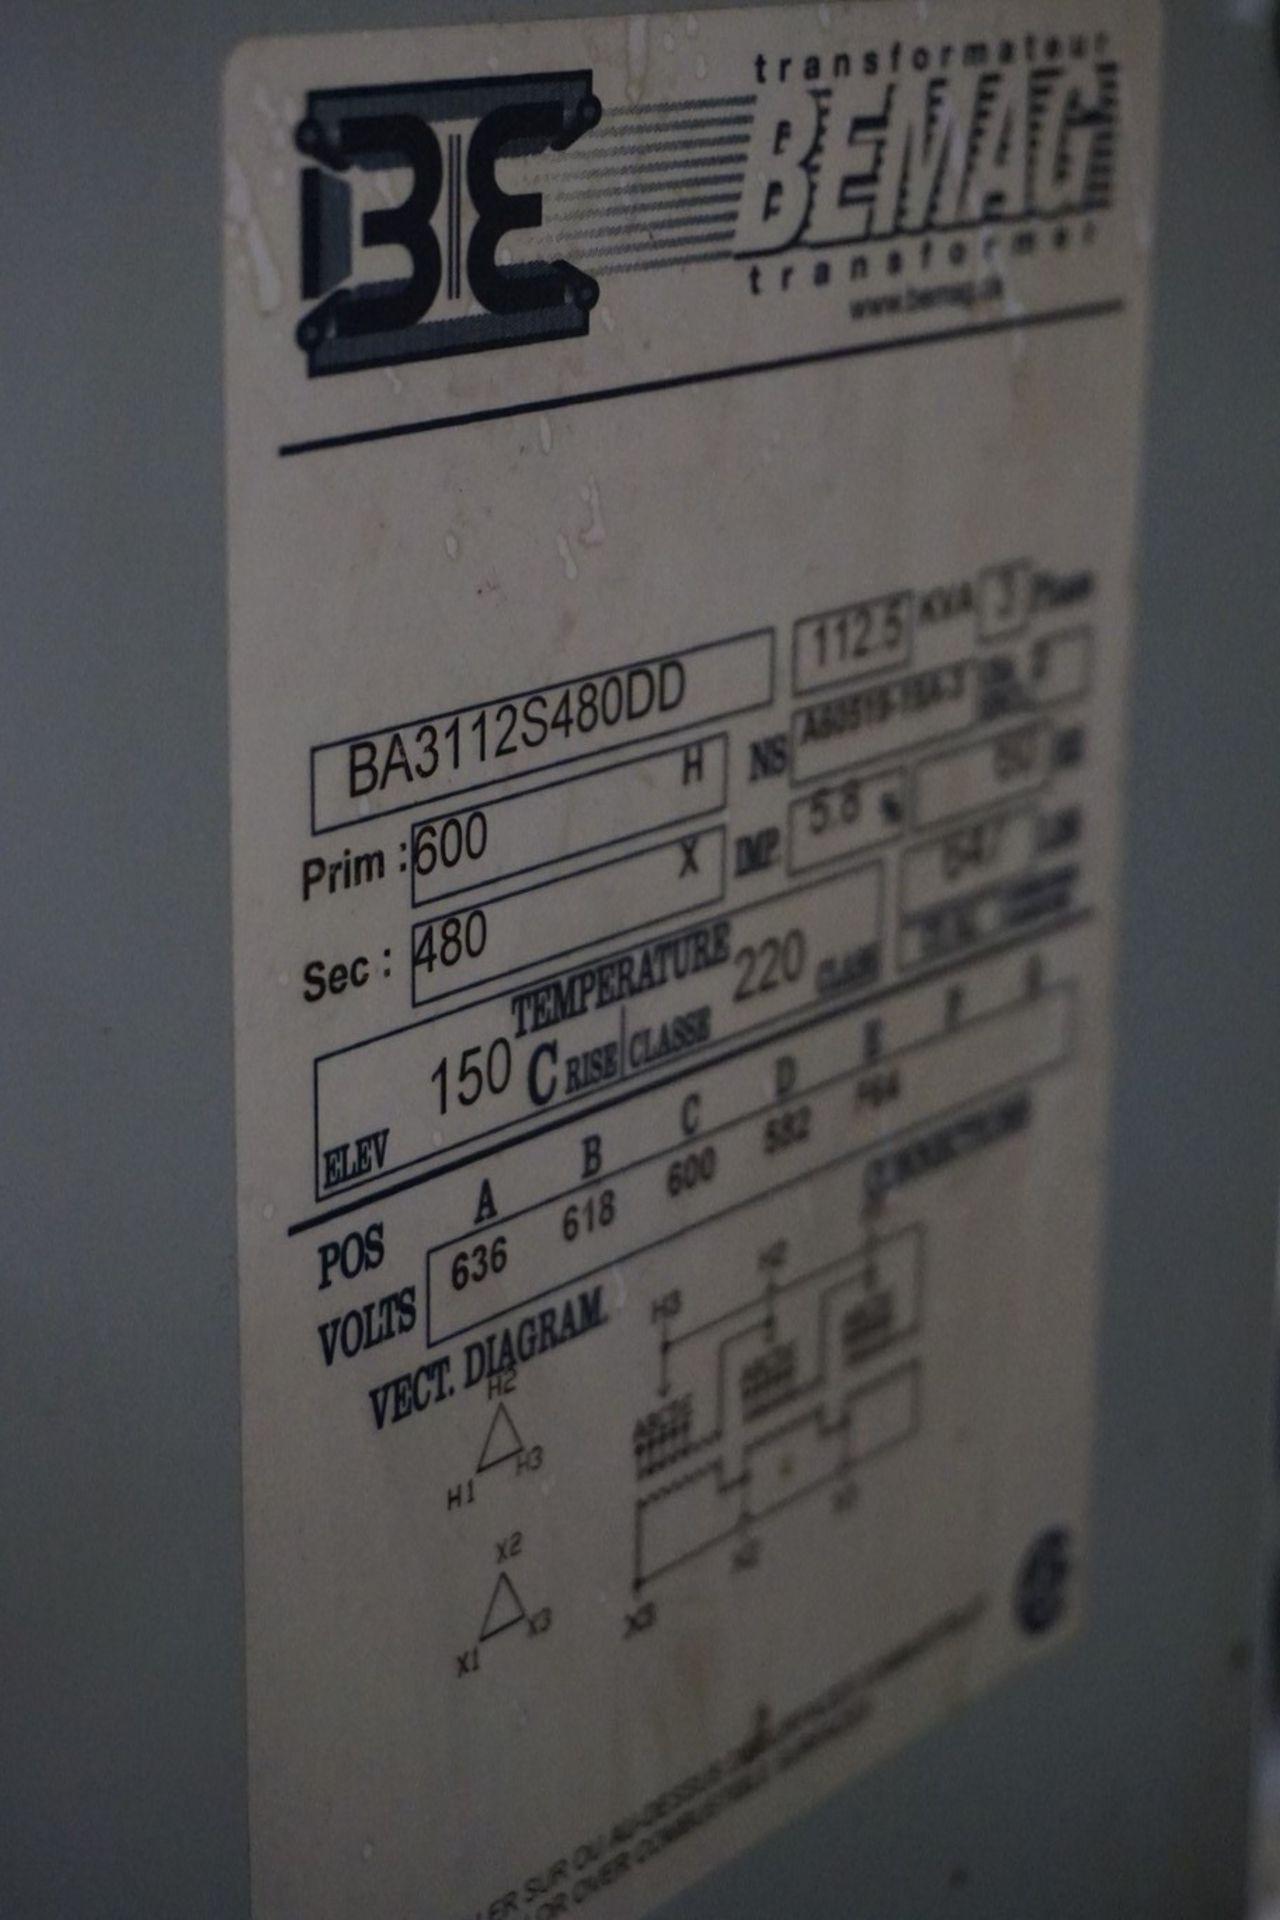 JVC Type 0H3-30C-375C 600V, 30 Kva Transformer - Image 2 of 2